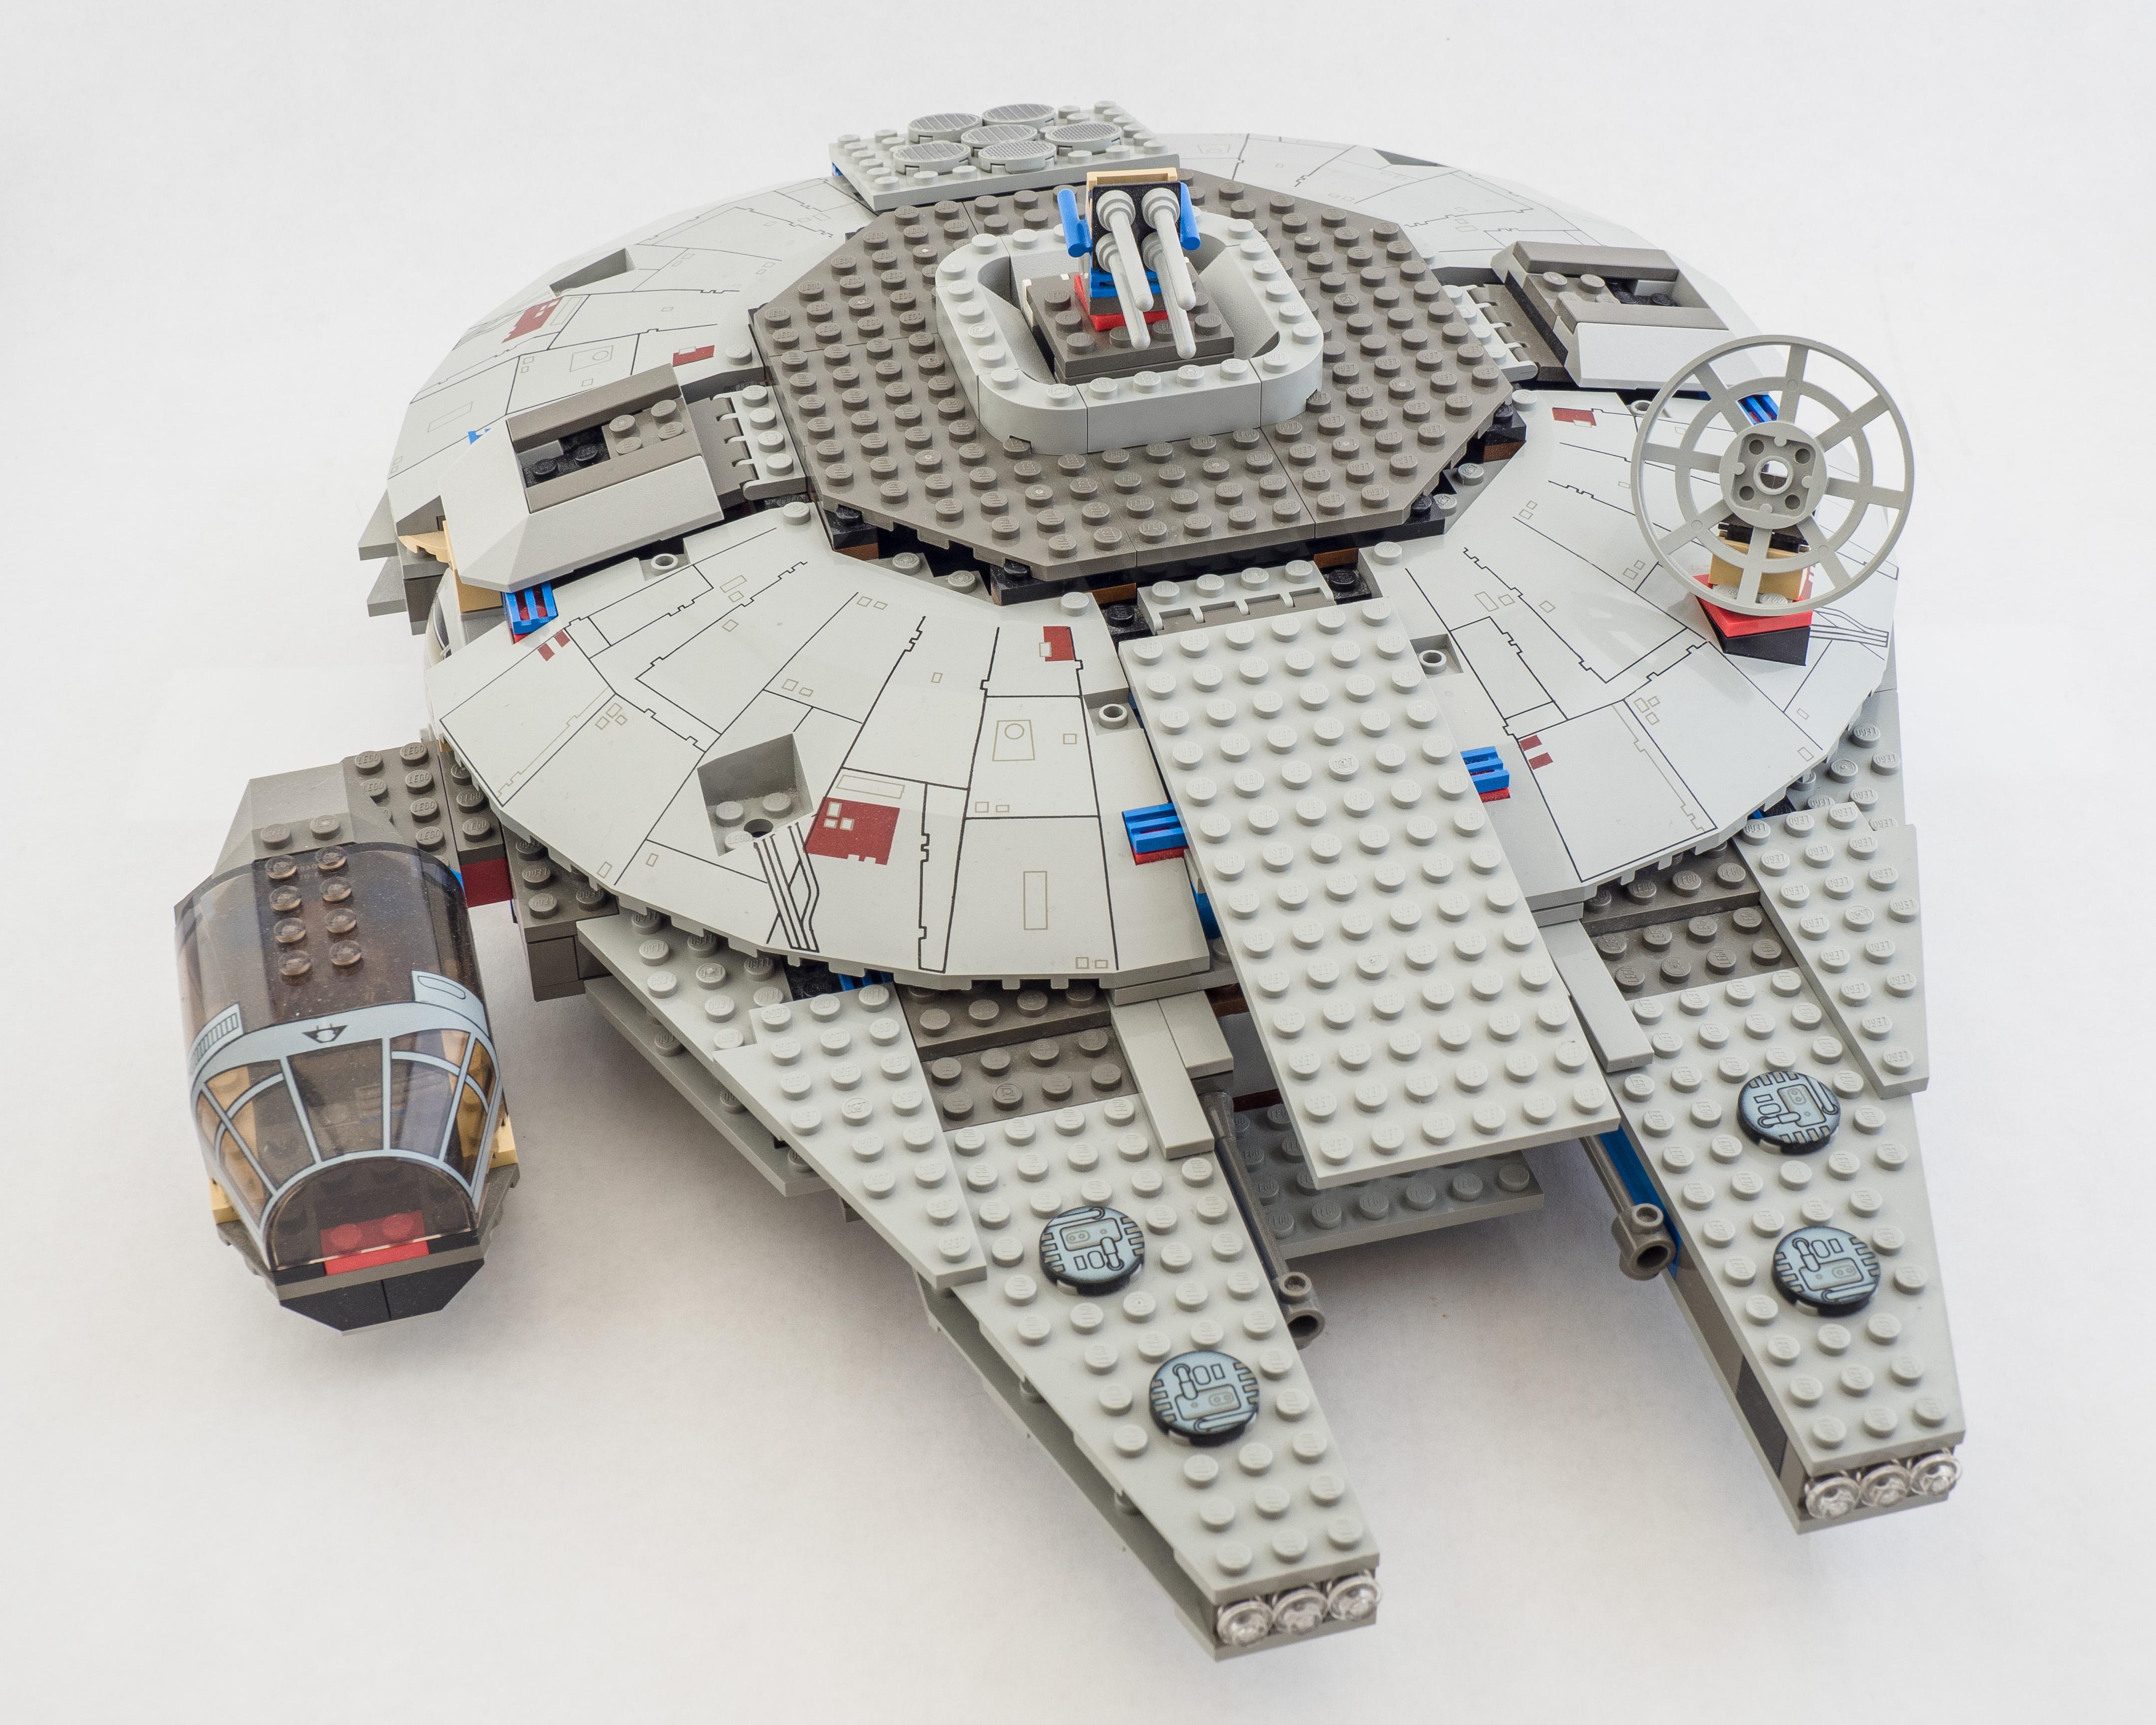 lego millennium falcon 7190